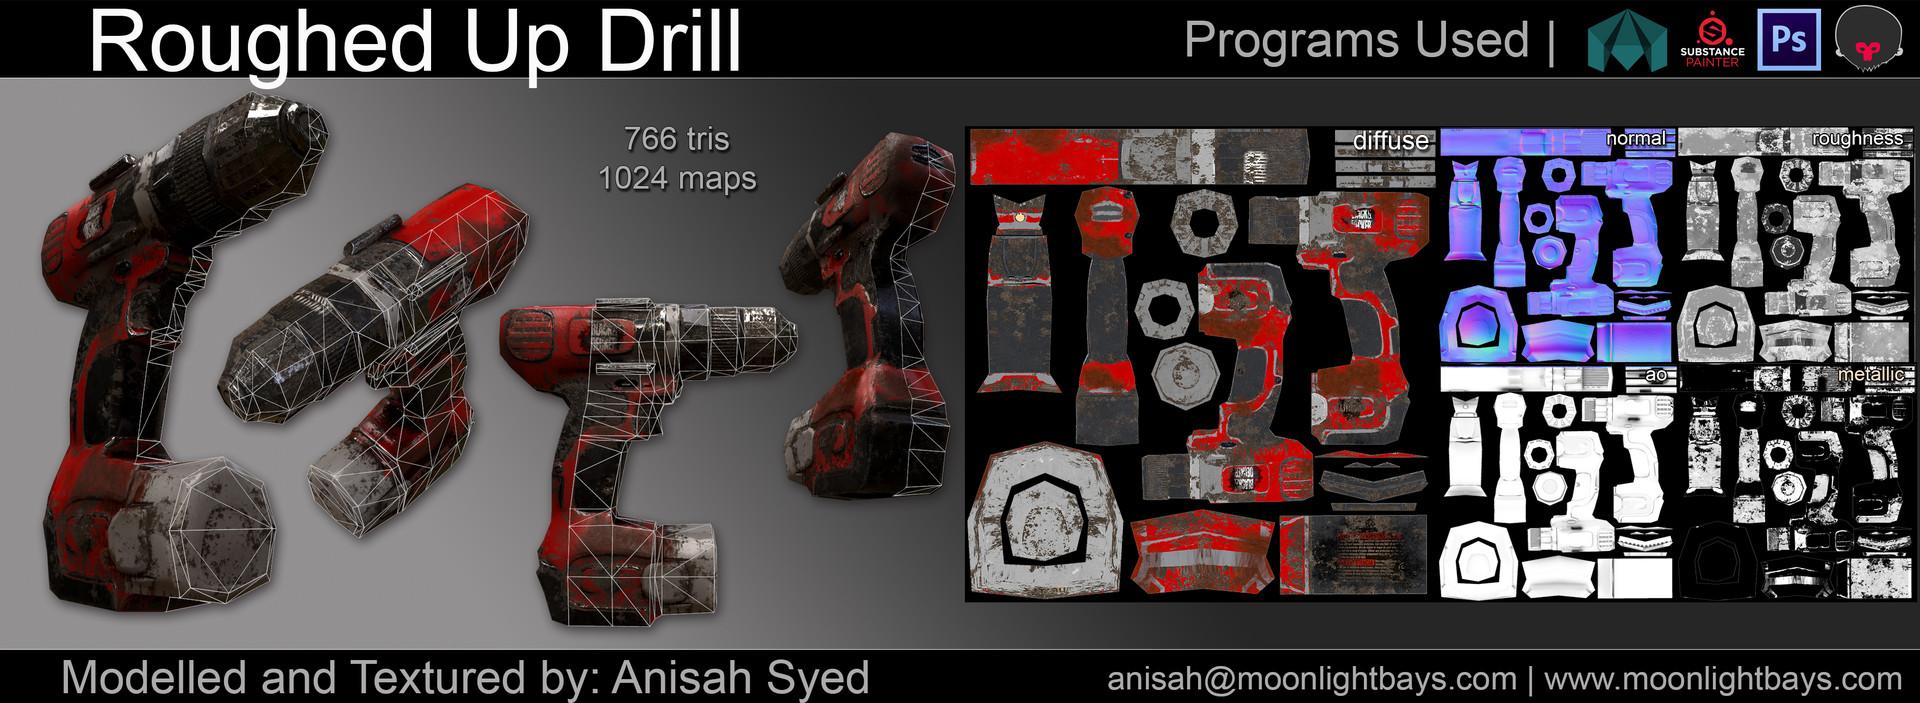 Anisah syed roughedupdrill